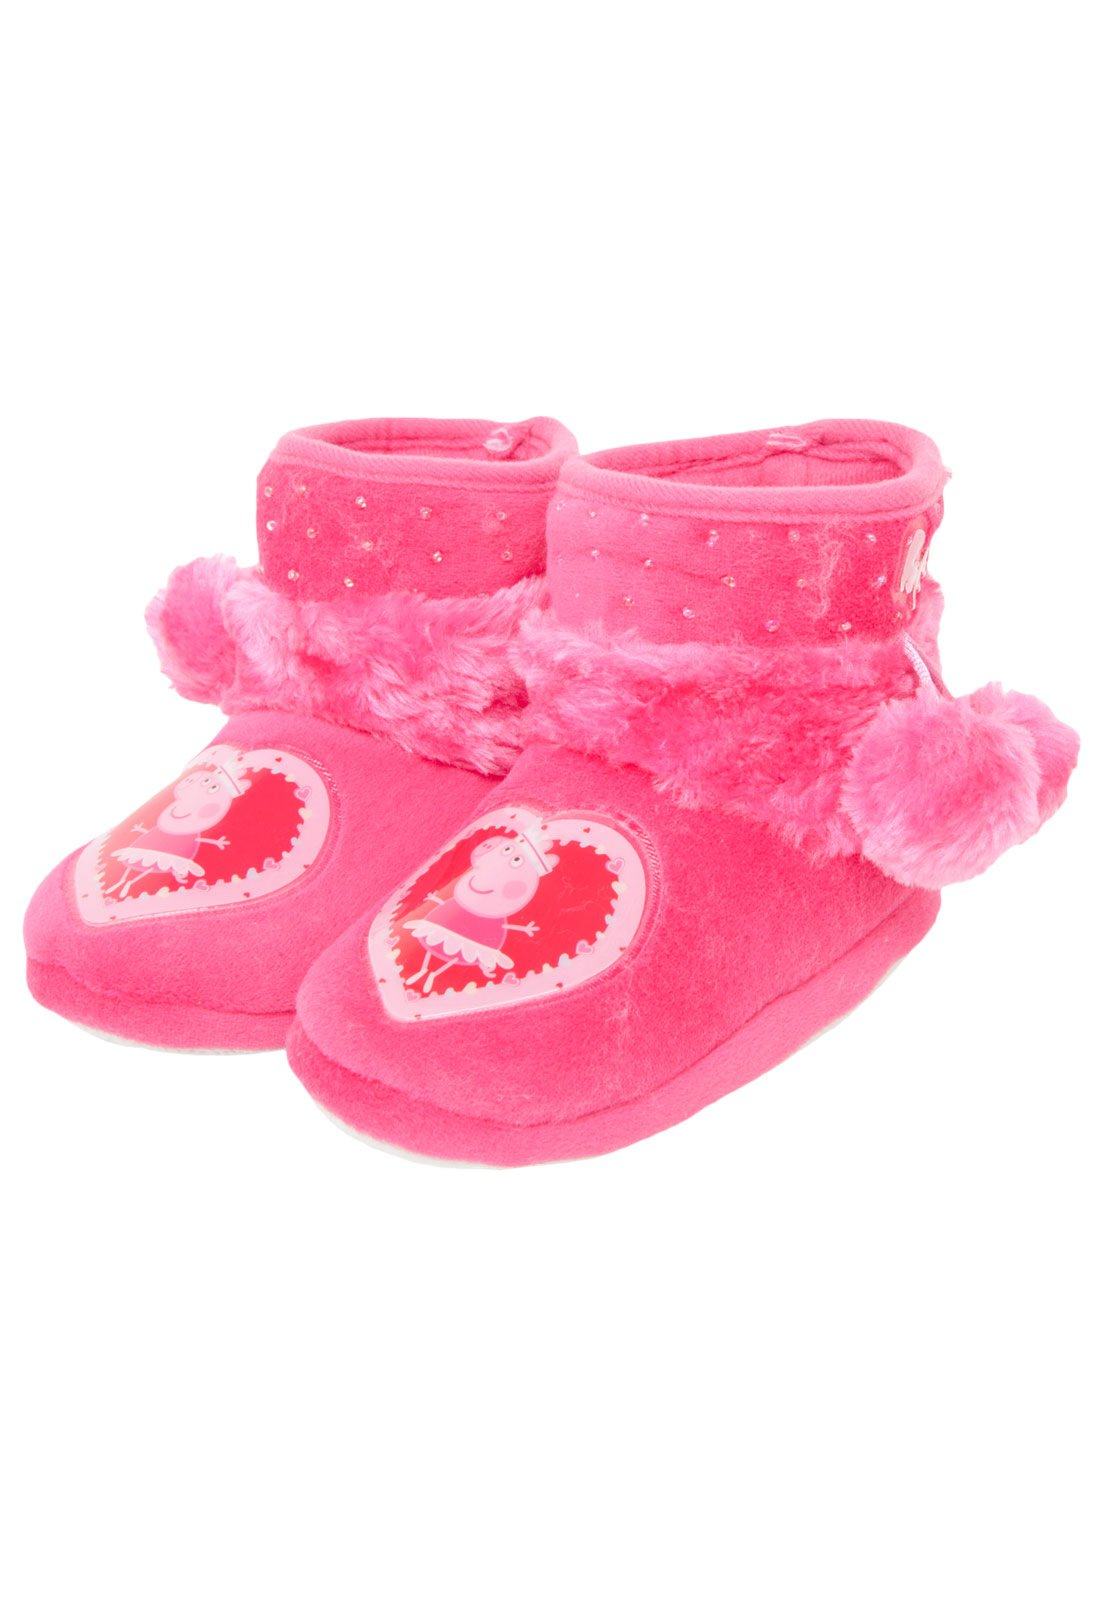 782986016e7b91 Pantufa Ricsen Infantil Peppa Pig Rosa